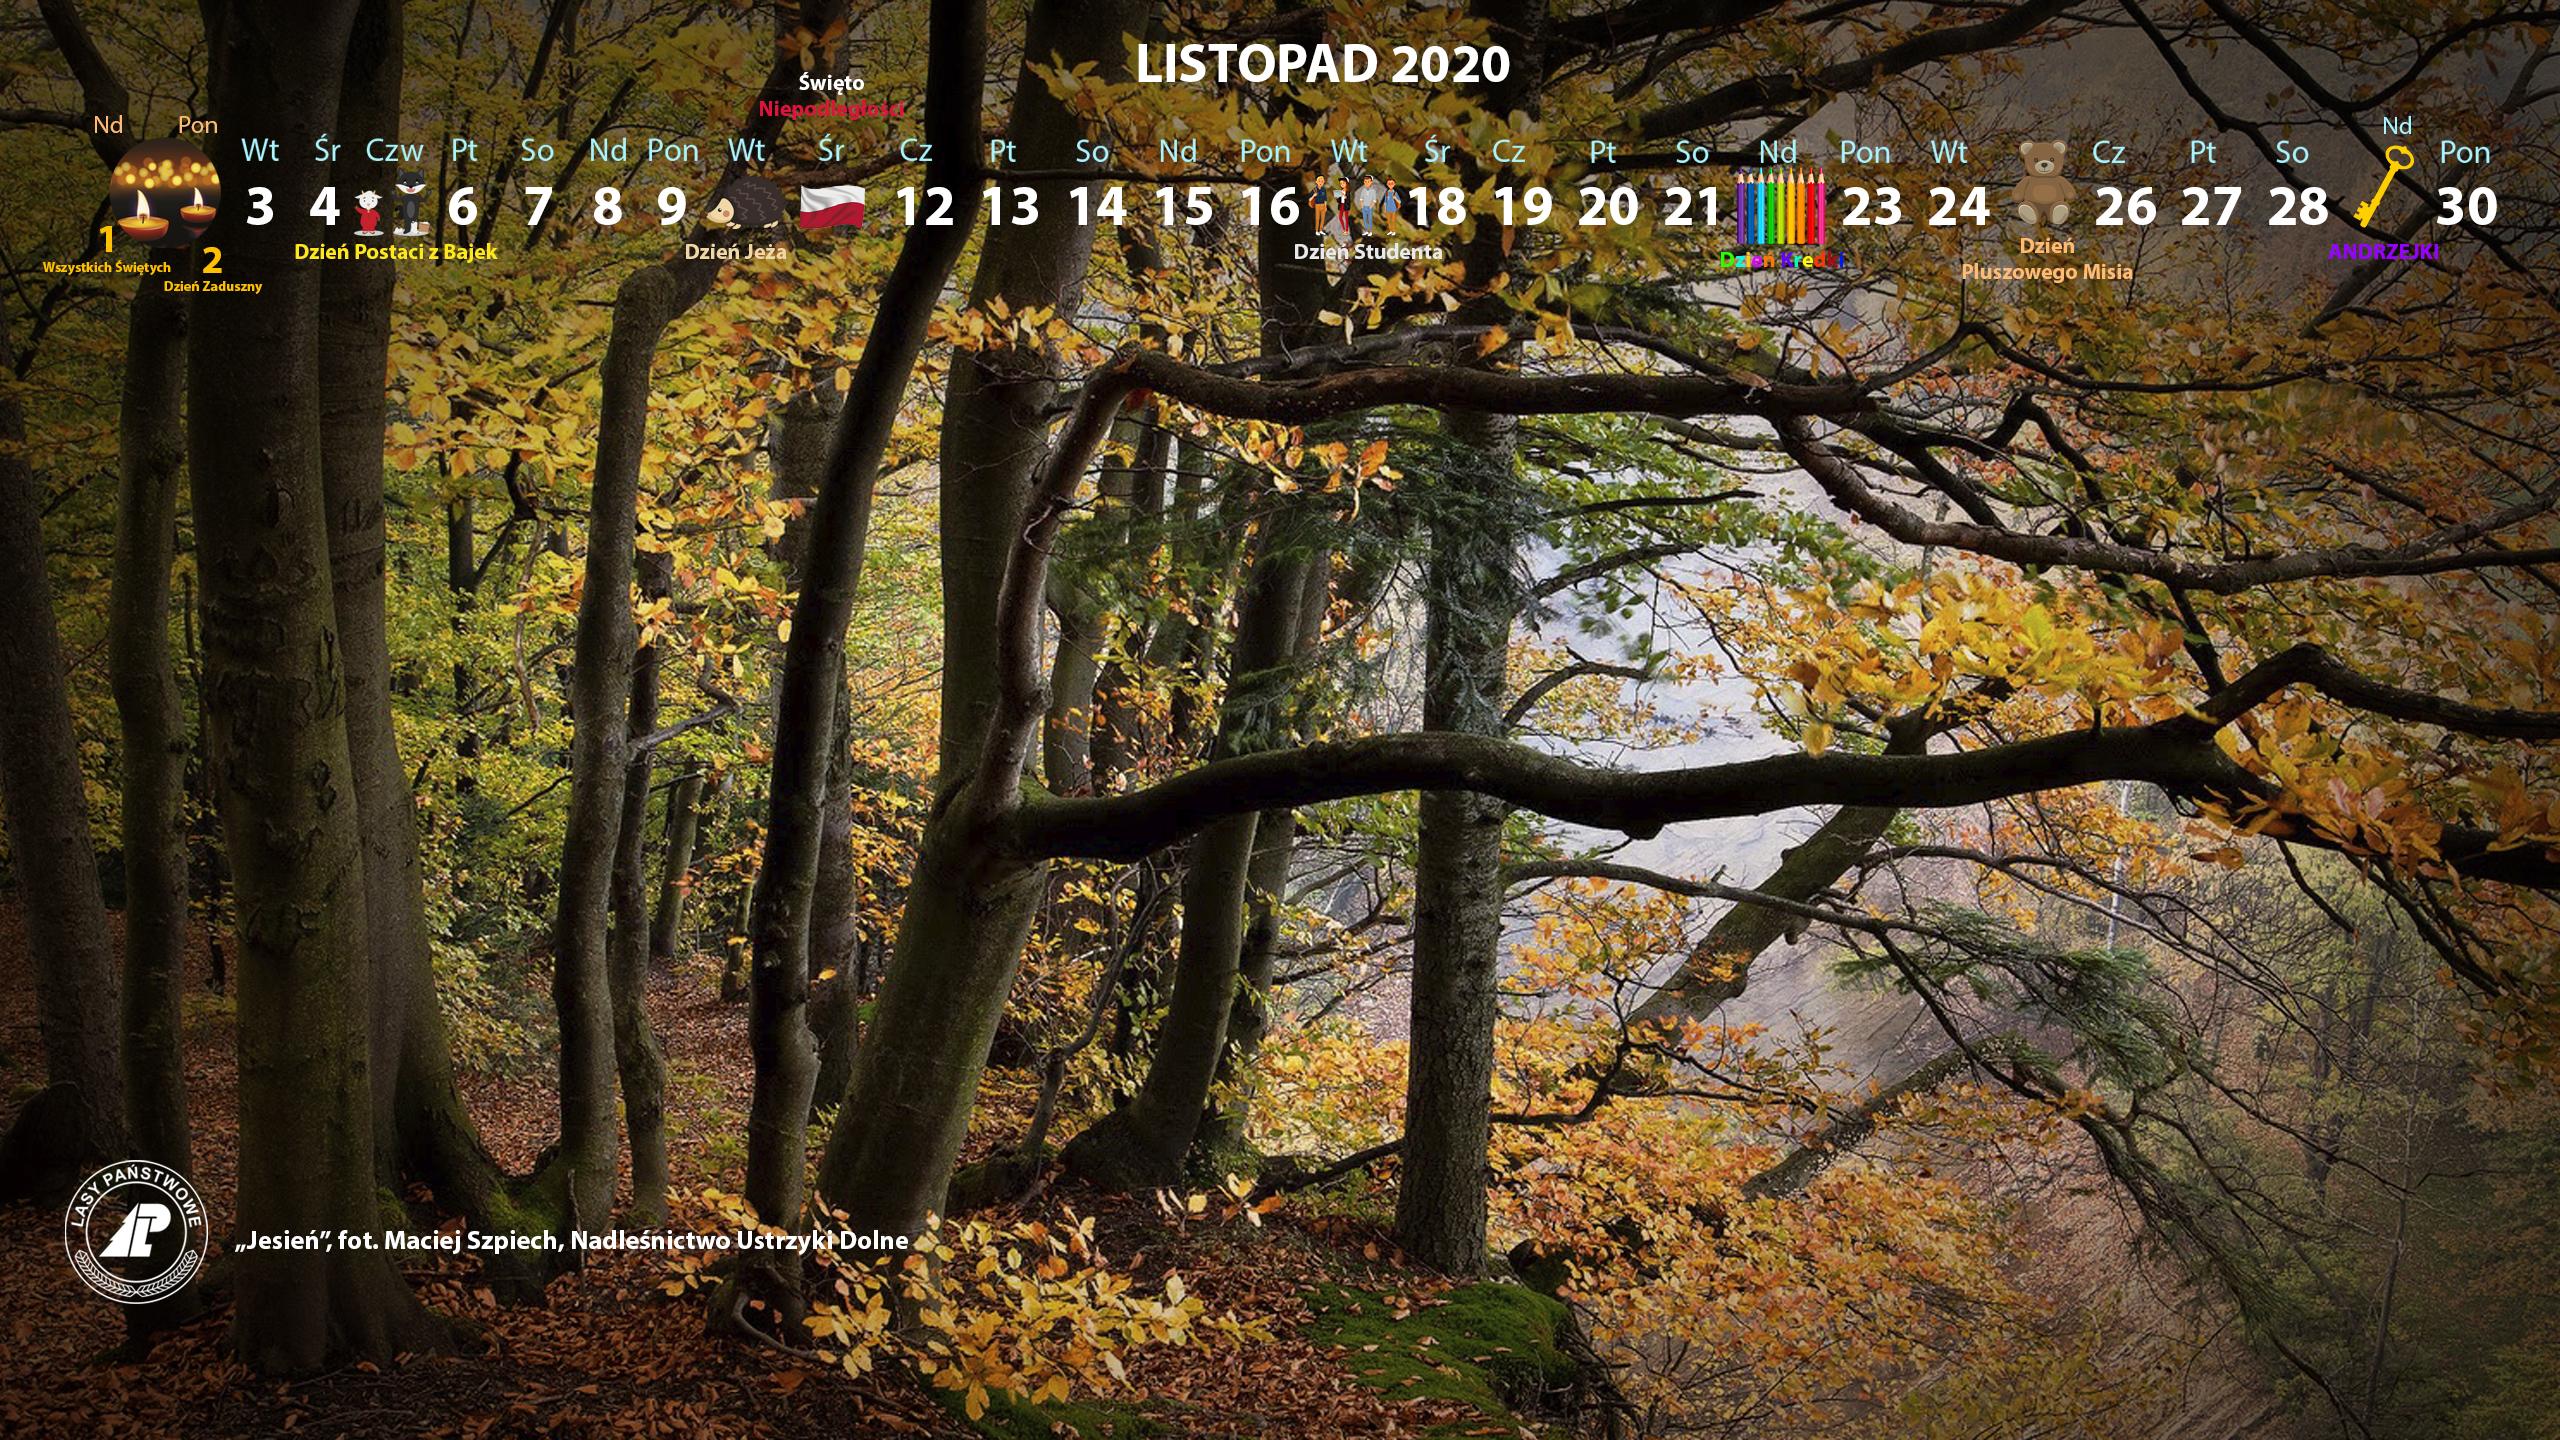 Kalendarz_listopad_2020_2560x1440[1].jpg